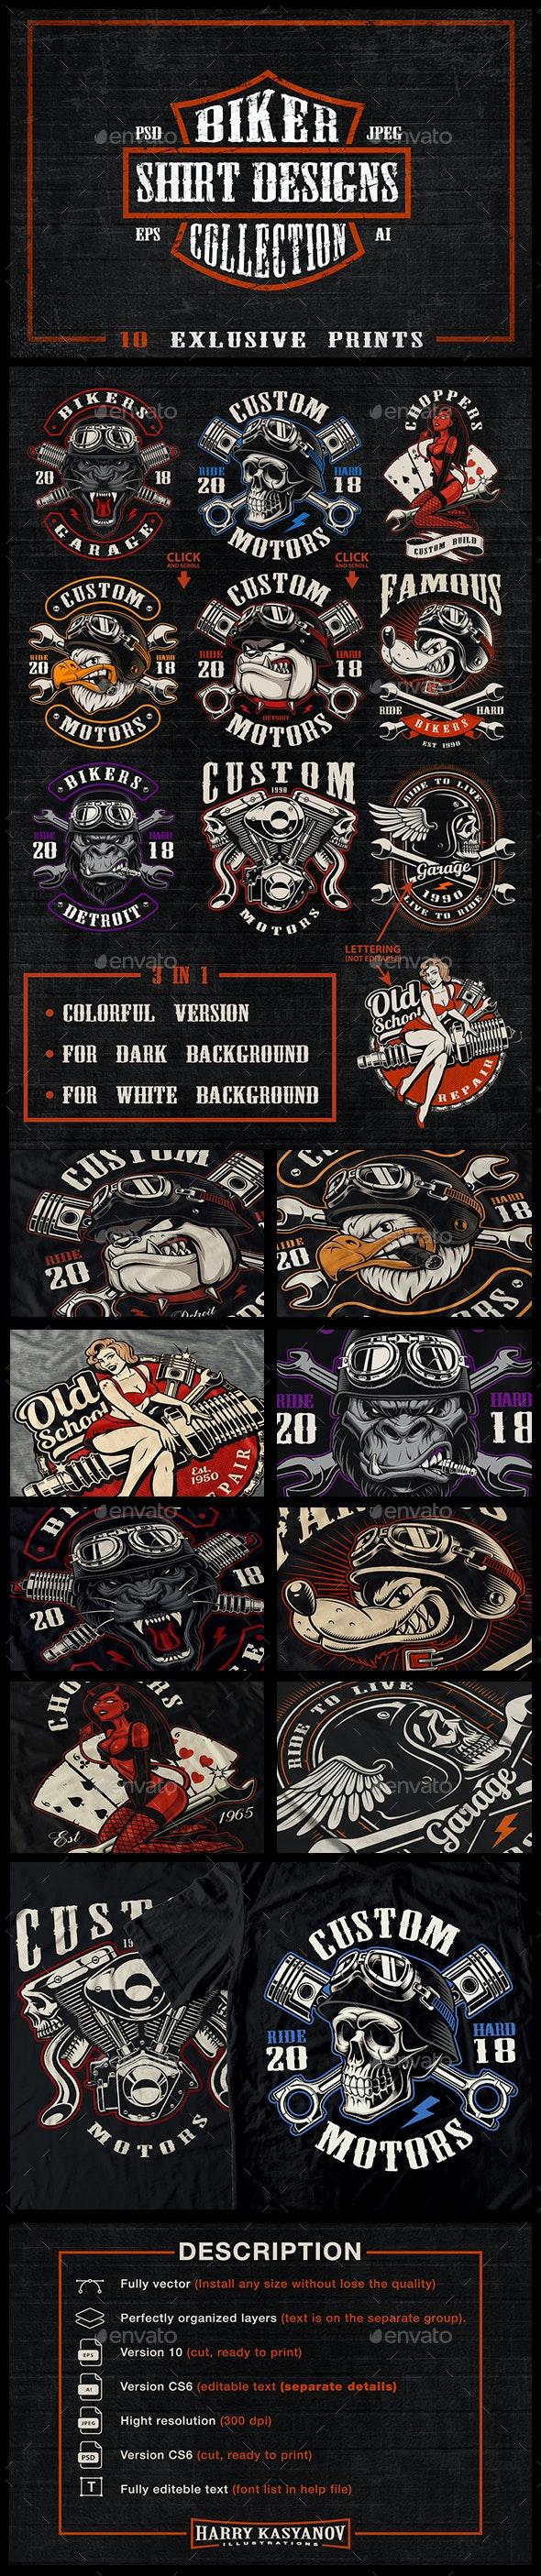 Bikers Shirt Designs Bundle - Designs T-Shirts